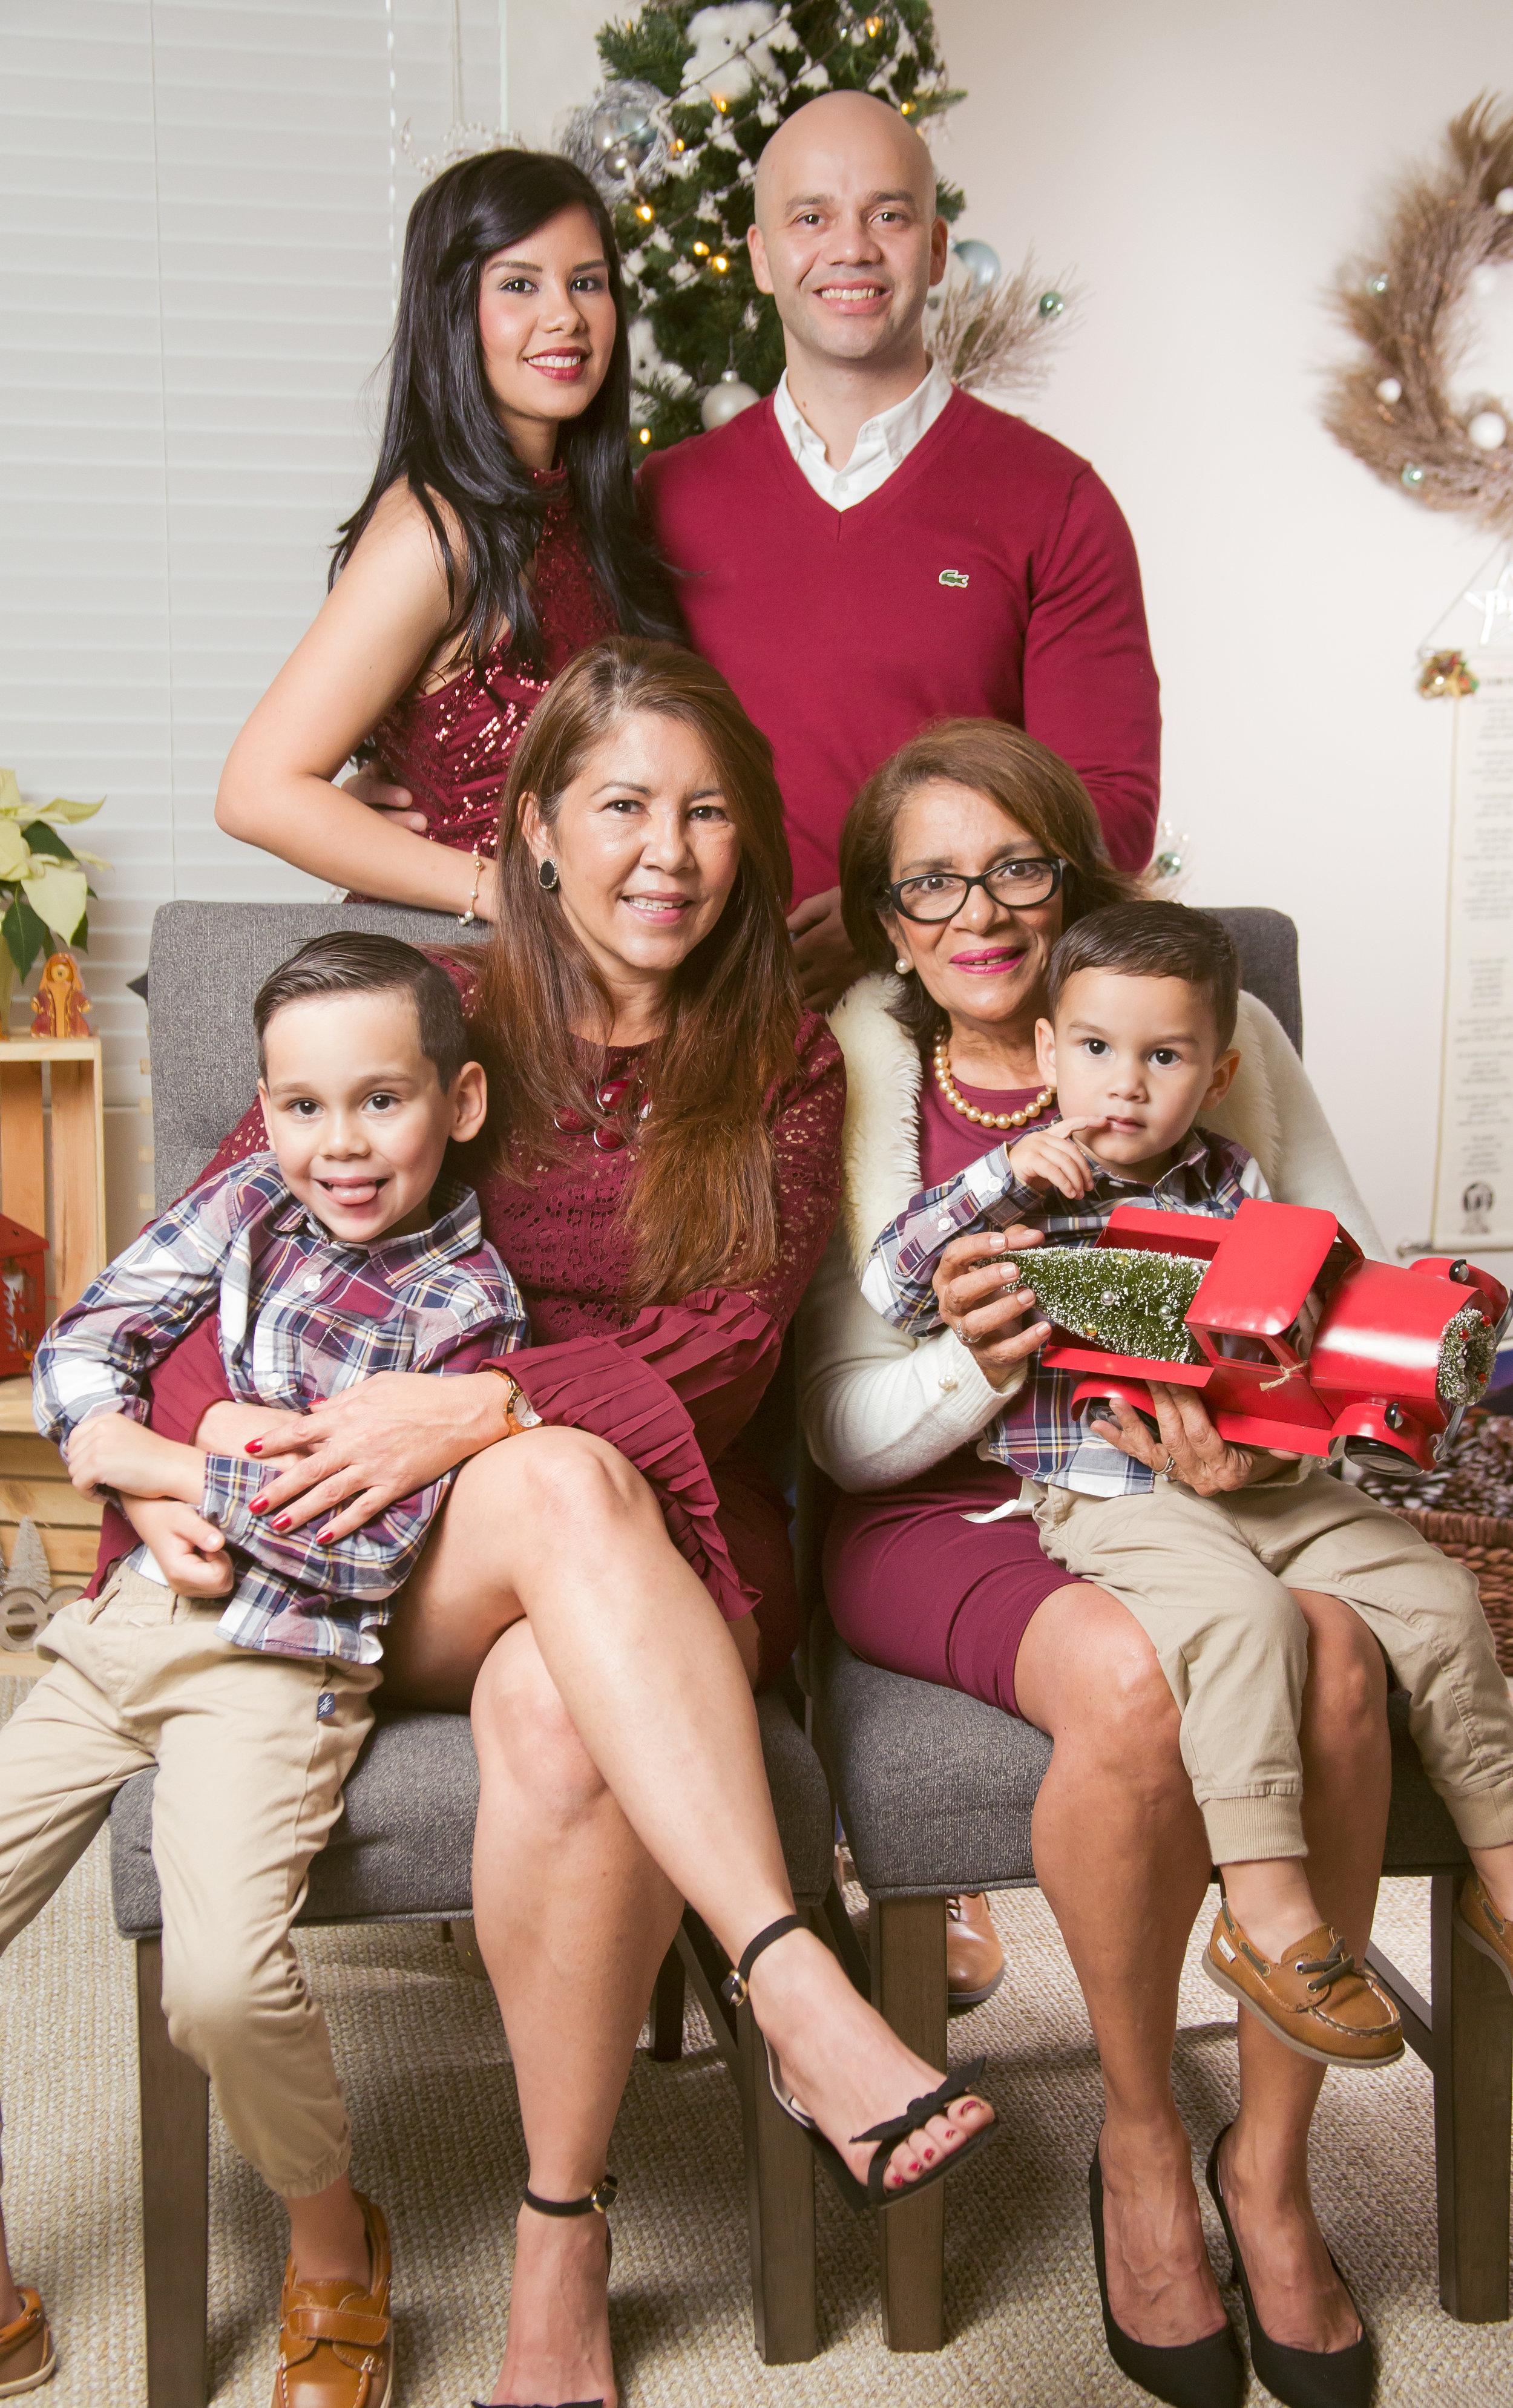 family-christmas-photo-chamber-photography-moments-antoine-hart.jpg